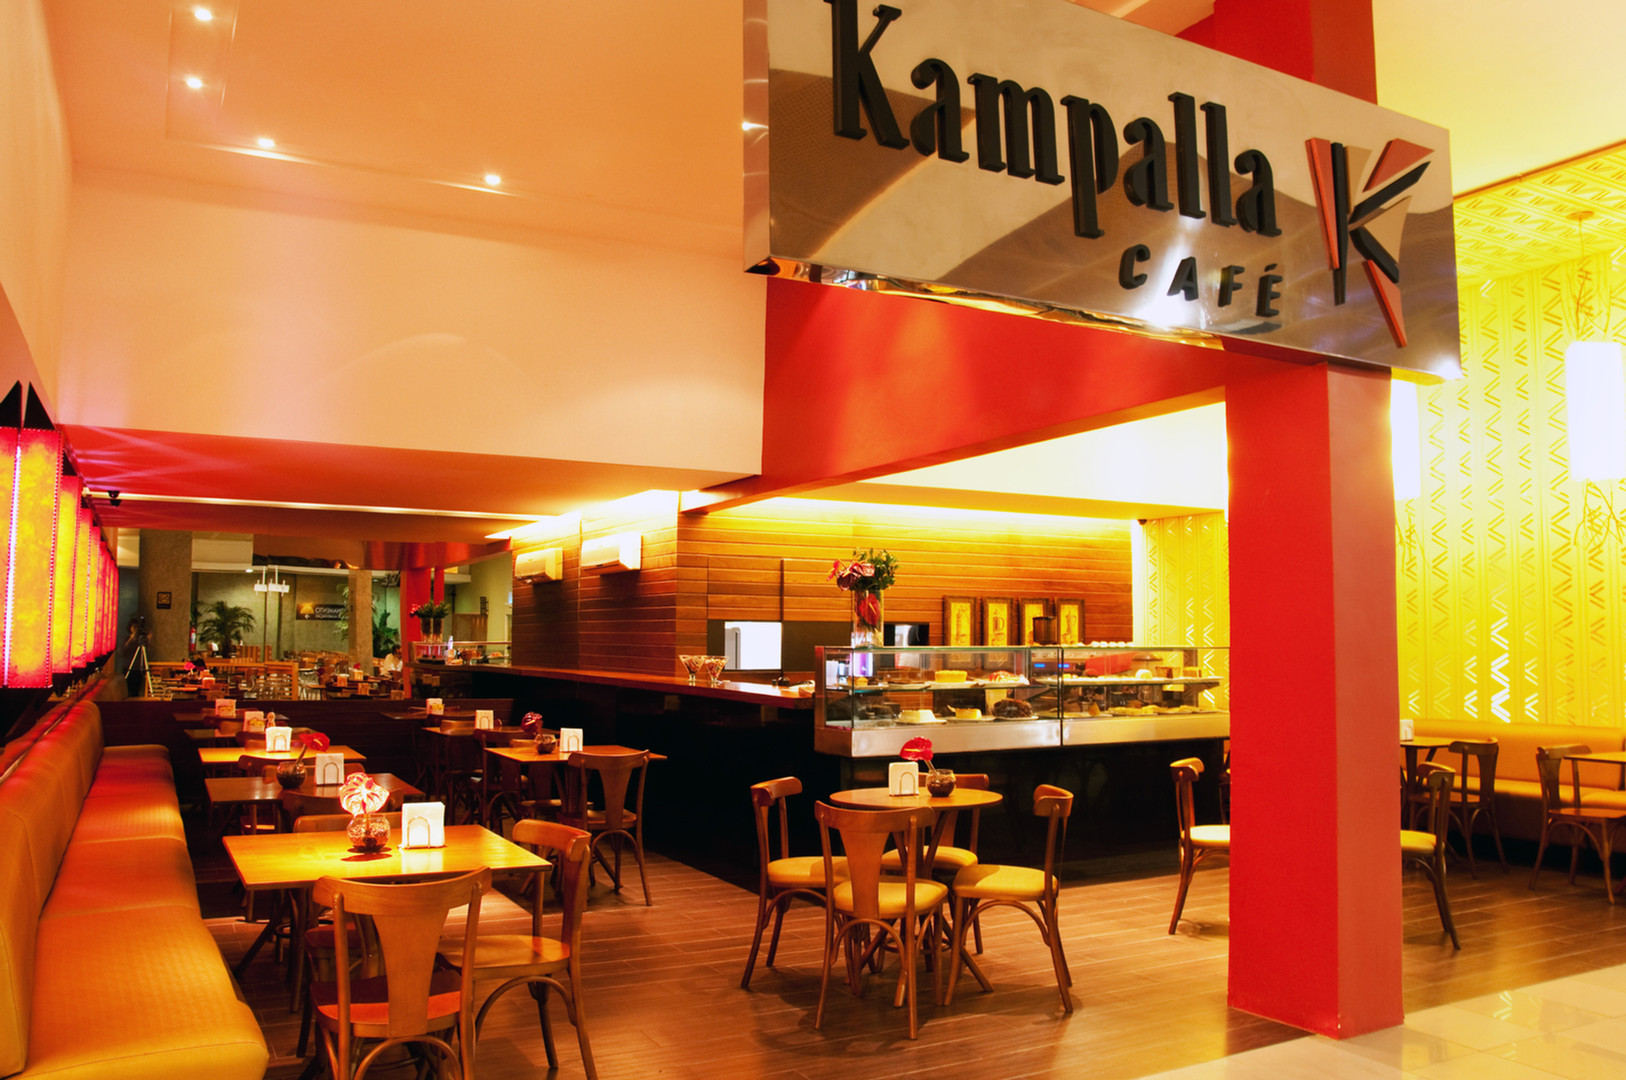 KAMPALLA CAFÉ - I